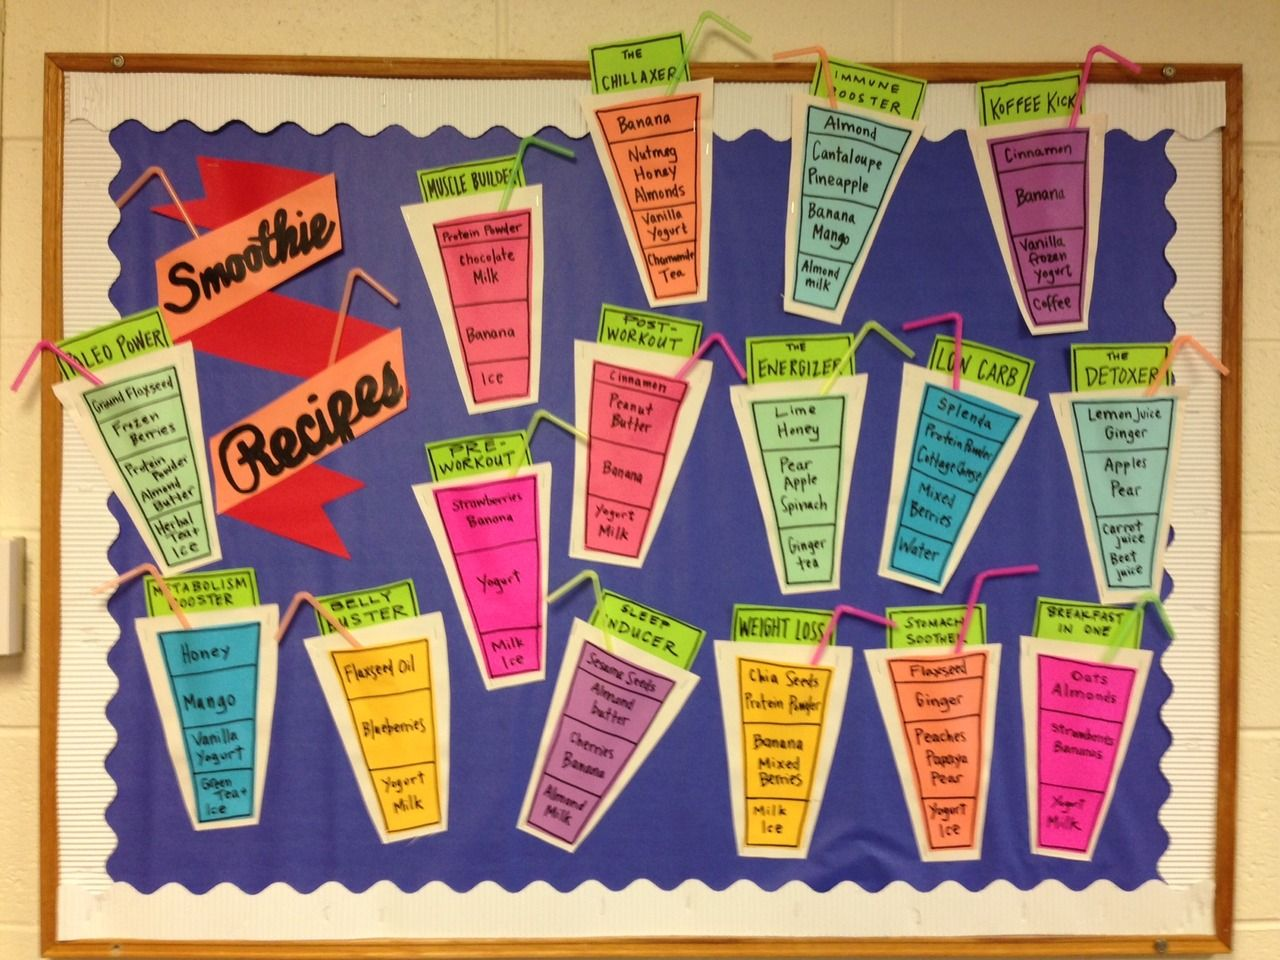 Classroom Bulletin Board Ideas Nutrition Month ~ Smoothie ideas great idea for a bulletin board in the